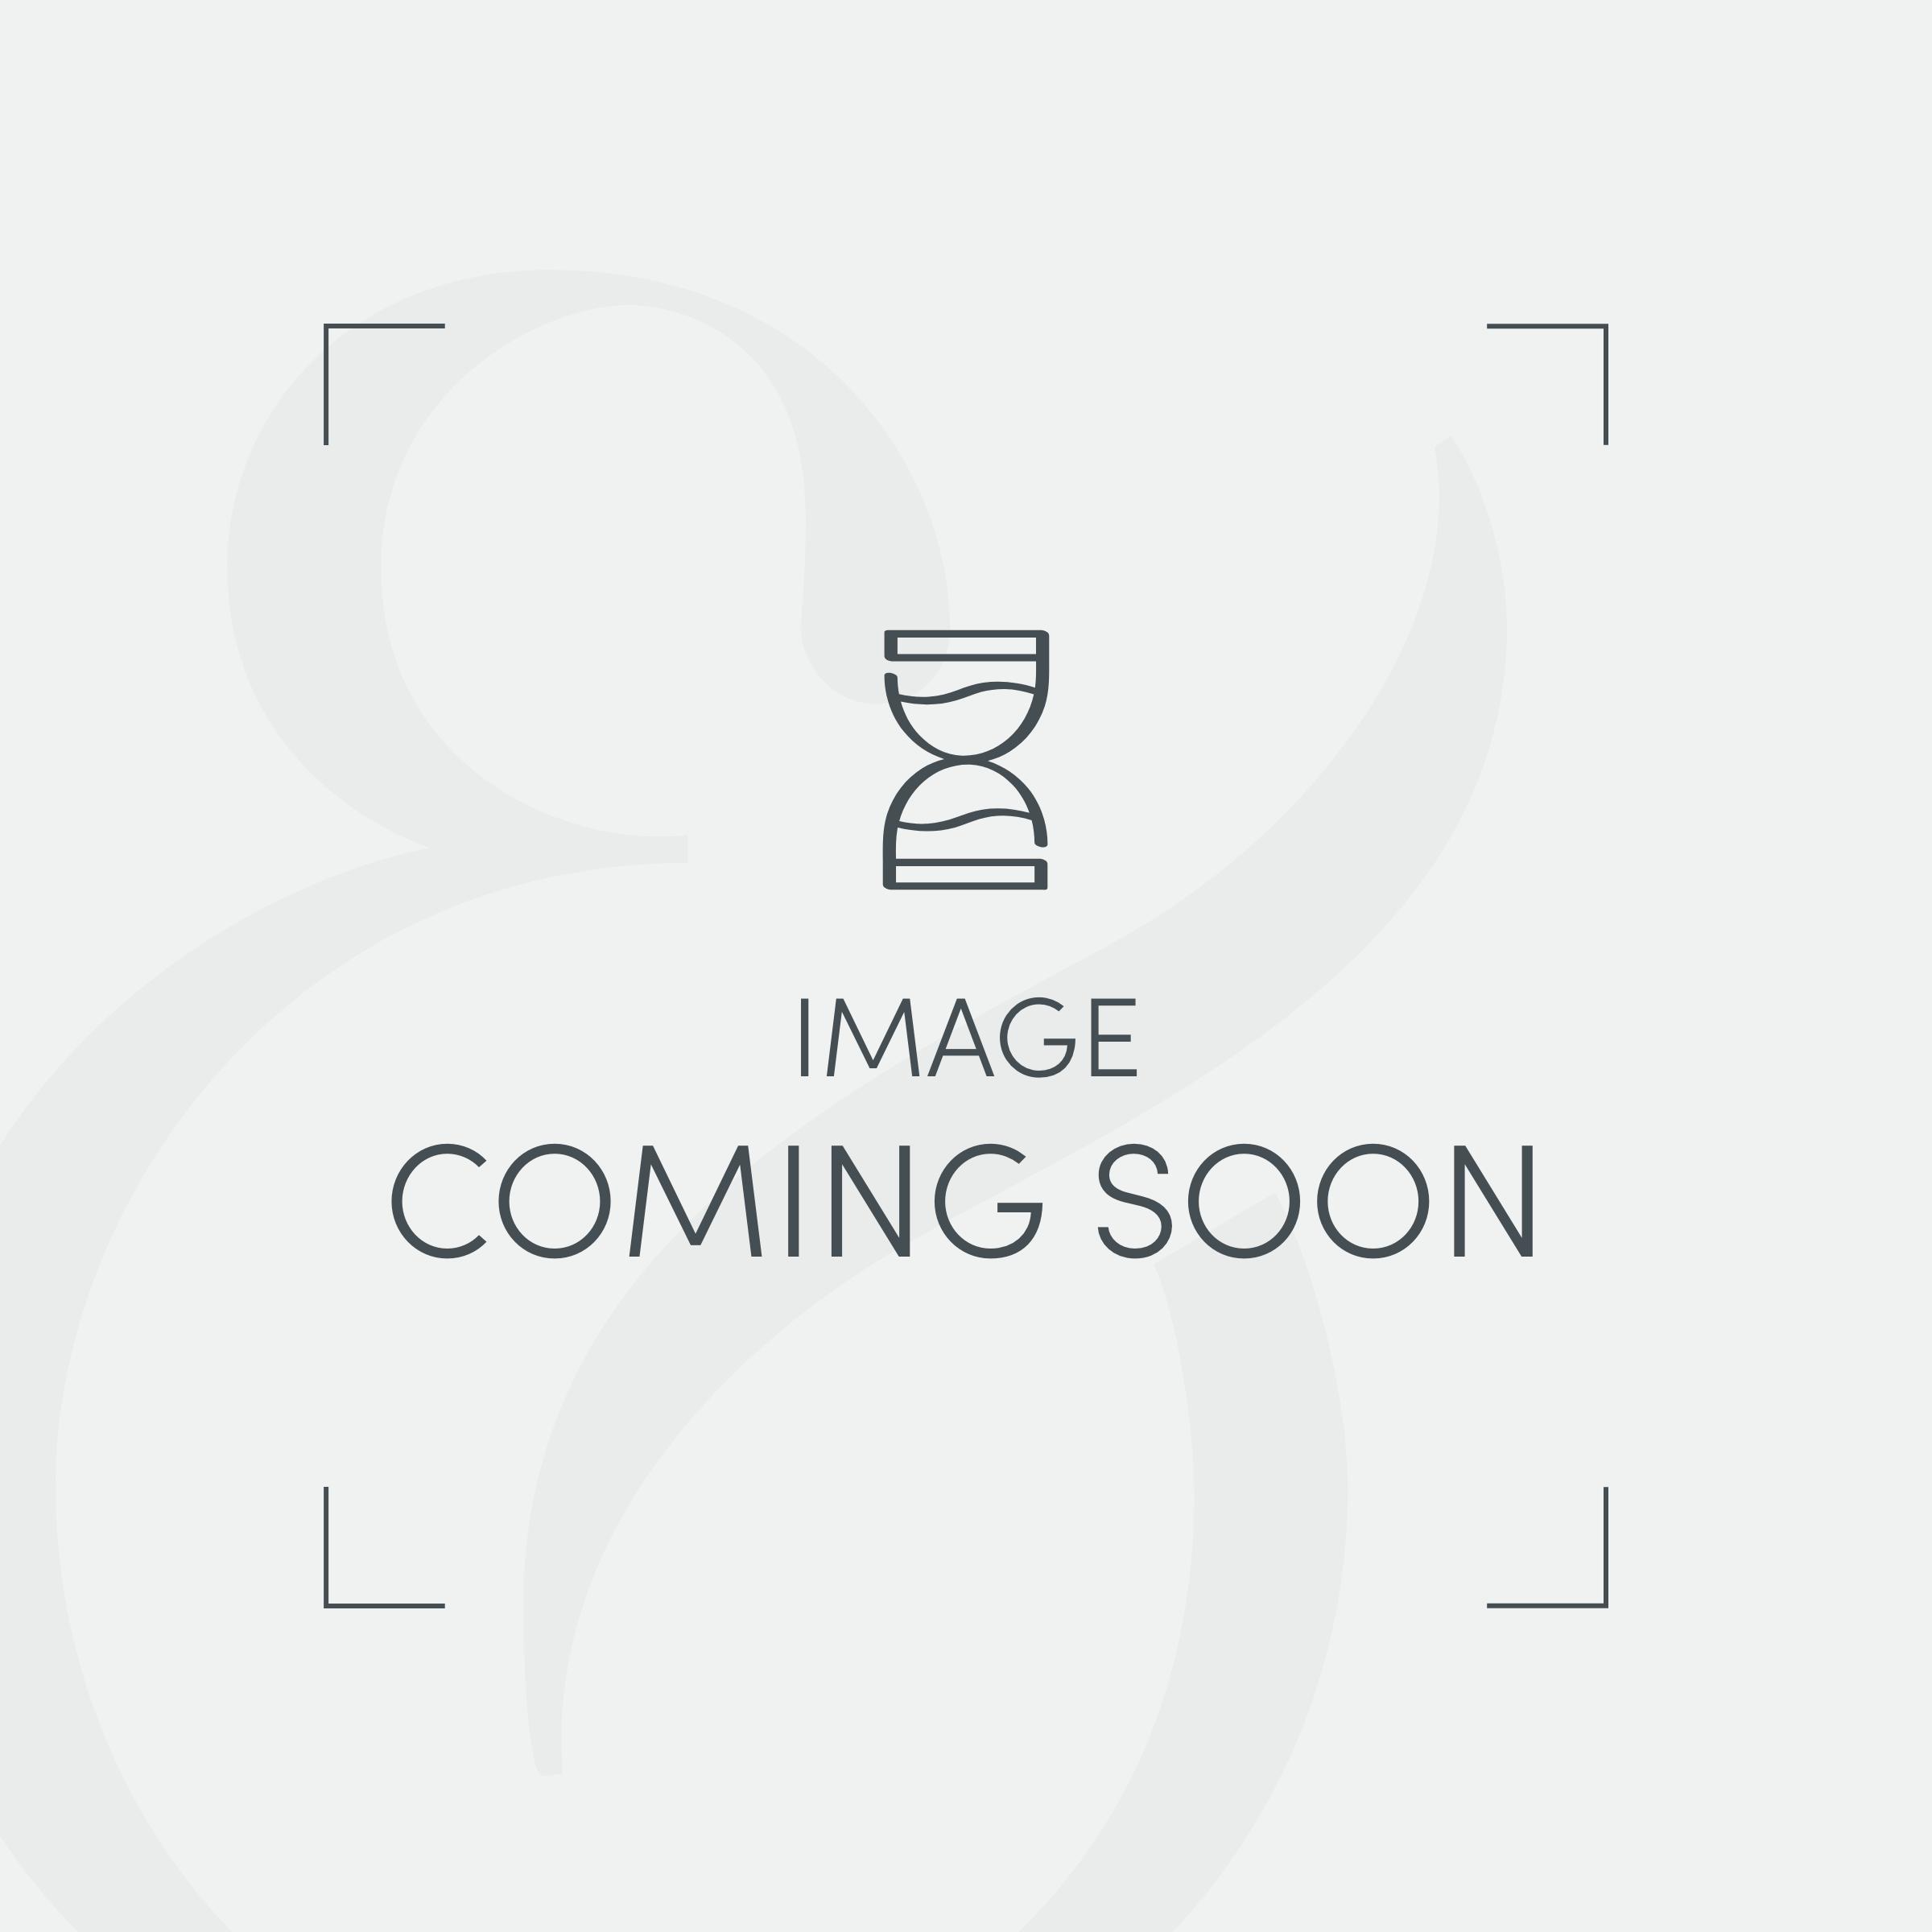 Ultimate Supima Cotton Towel Set (2 x Hand Towels, 2 x Bath Towels) - White